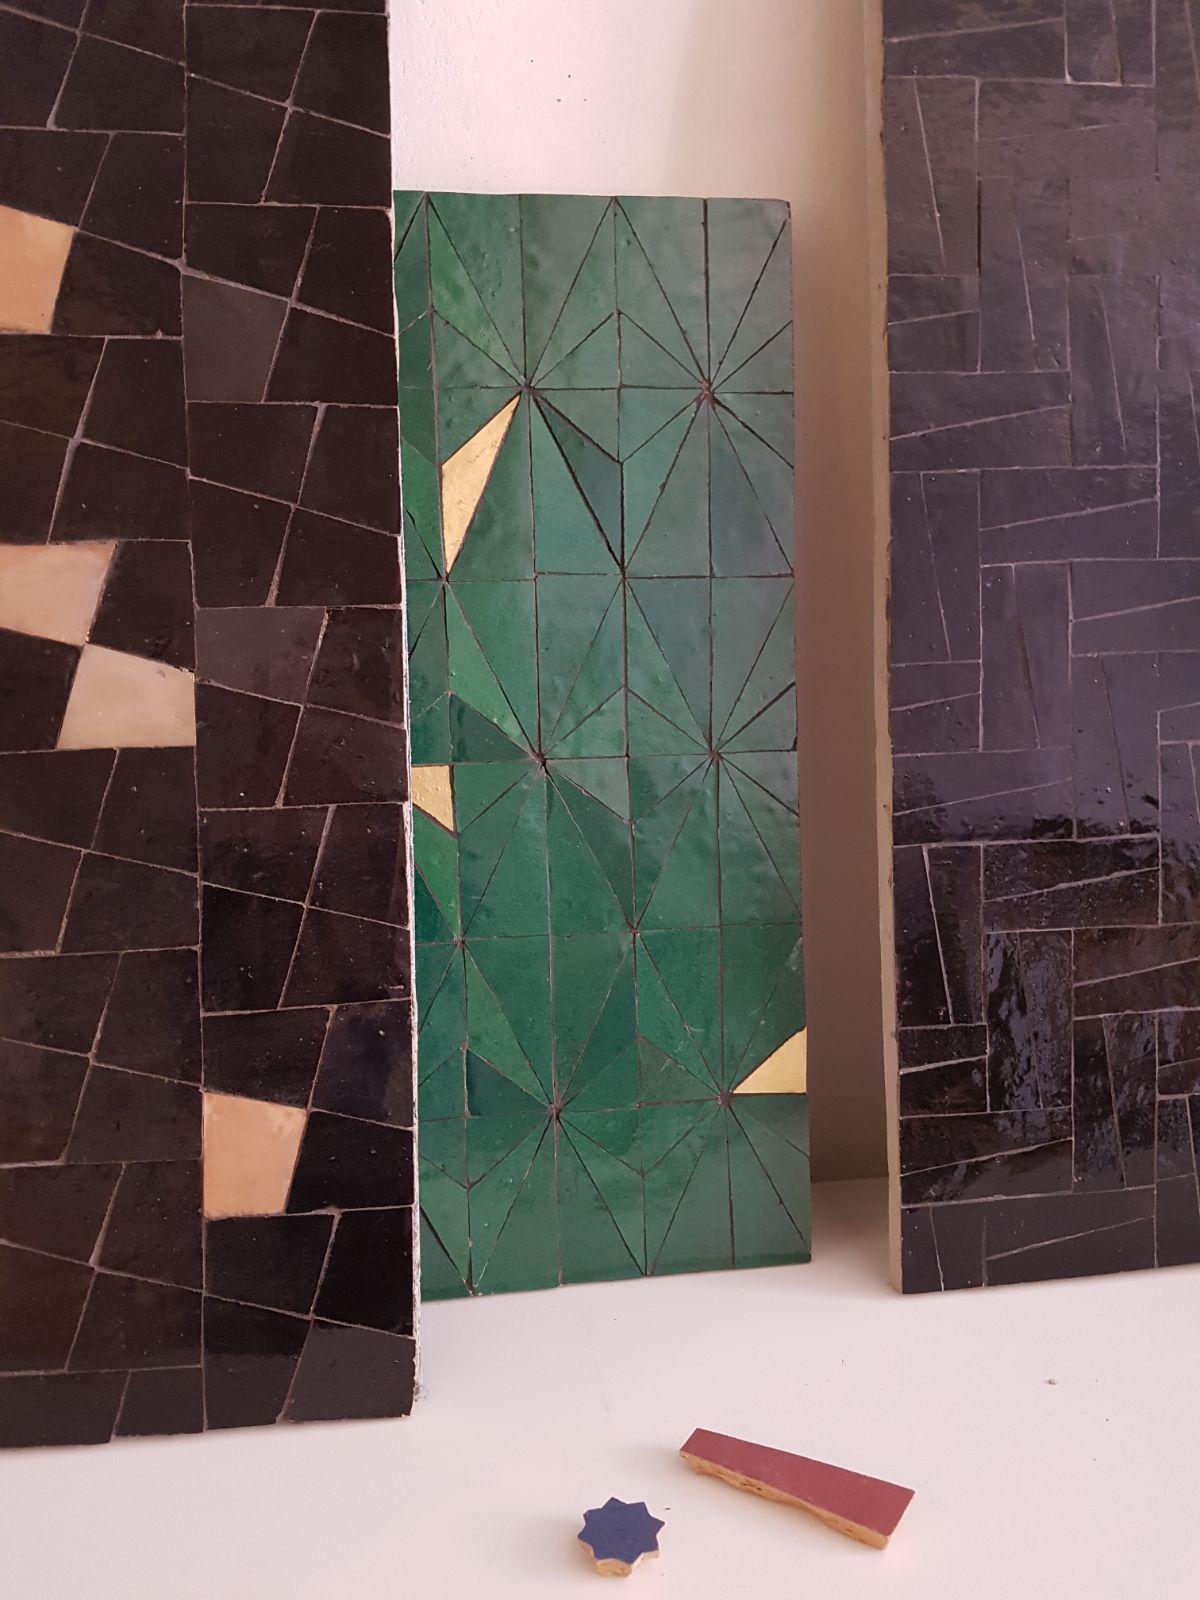 Creative Collection Ateliers Zelij Design Samir Mazer Carreaux Ciment Carreau Artisanat Marocain